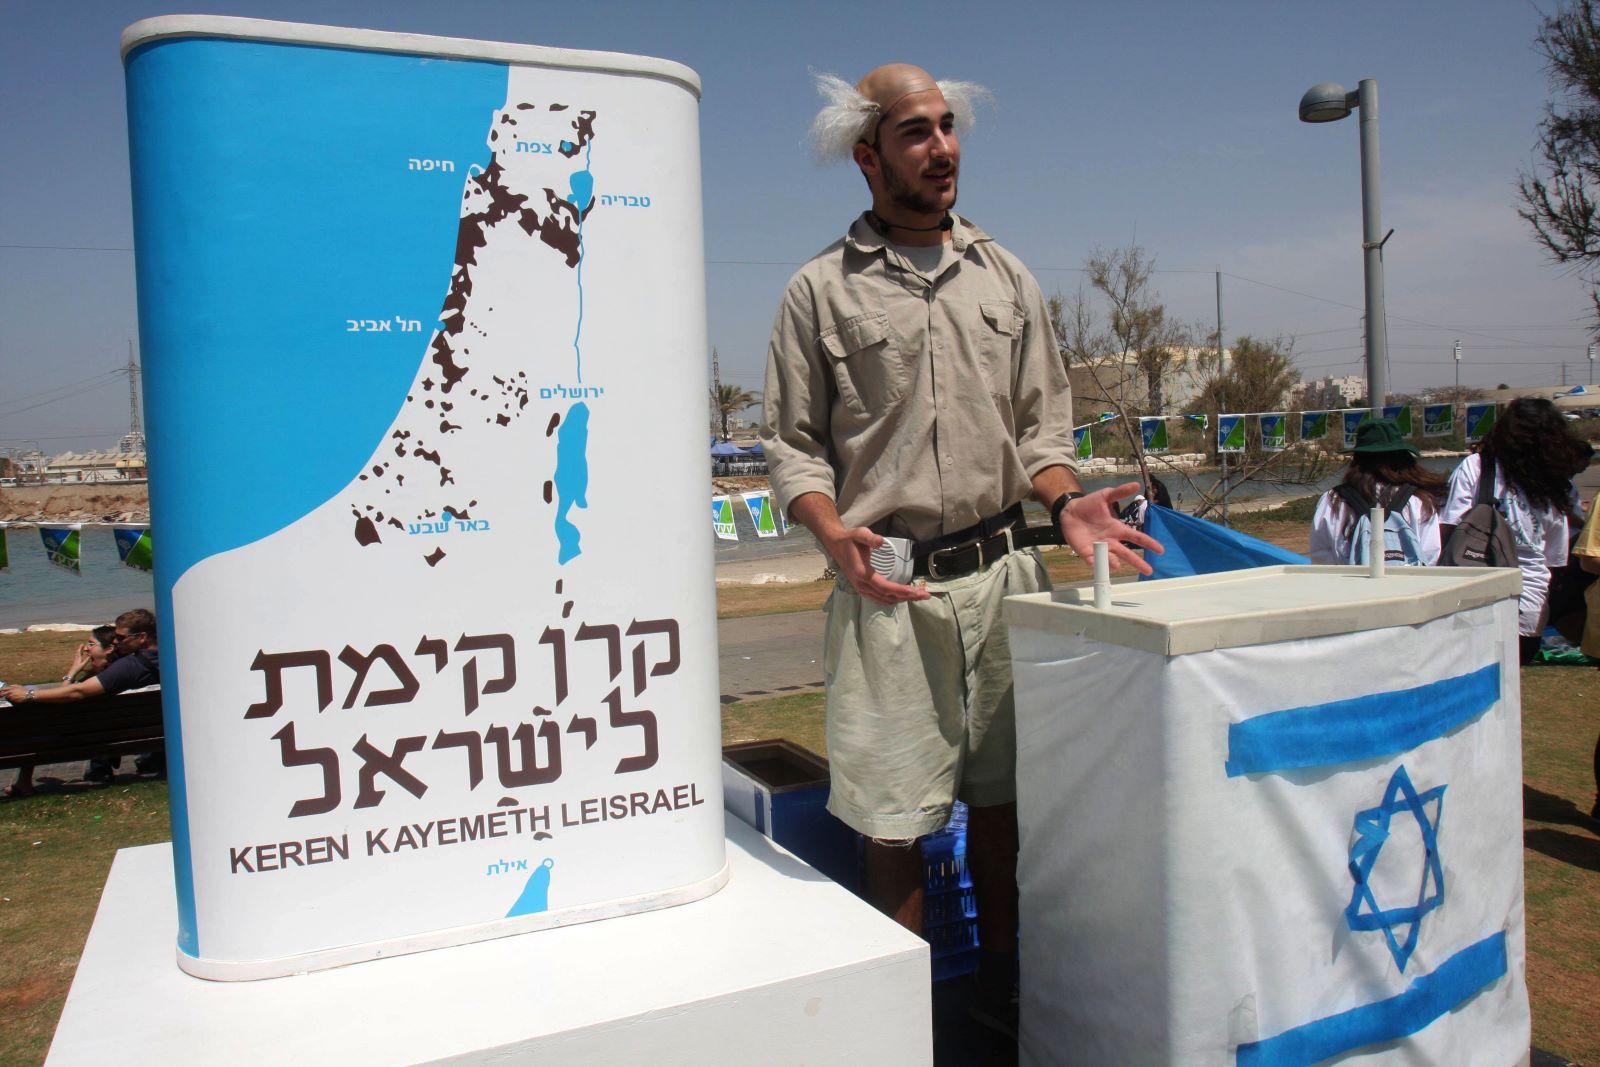 An Israeli dressed as David Ben-Gurion standing next to a KKL-JNF sign during celebrations of Israel's 61st Independence Day, in Tel Aviv. April 28, 2009. (Roni Schutzer/Flash90)